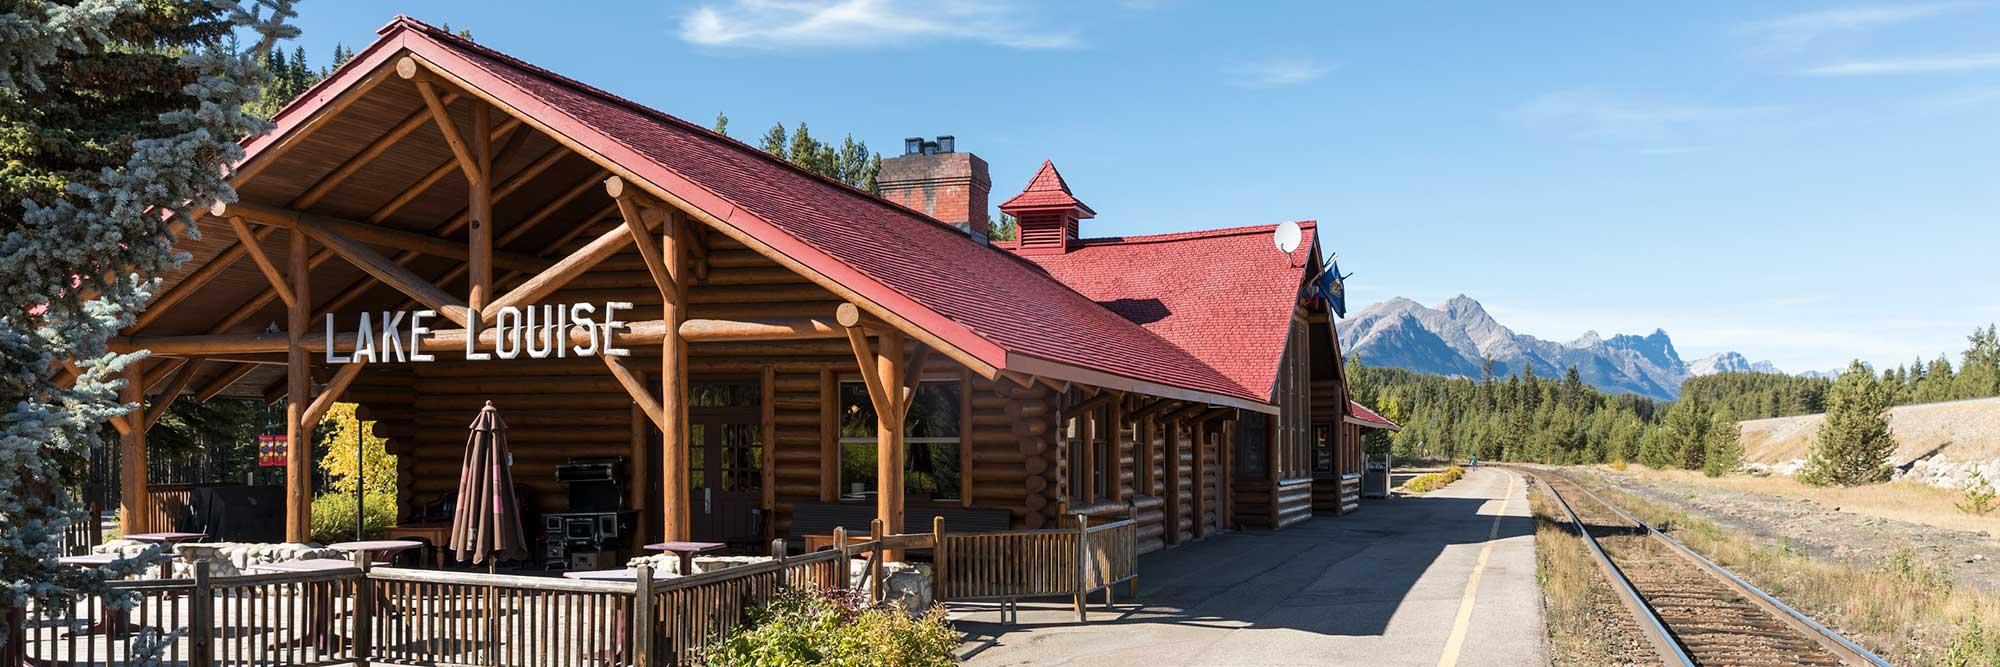 Lake Louise Train Station, Banff National Park